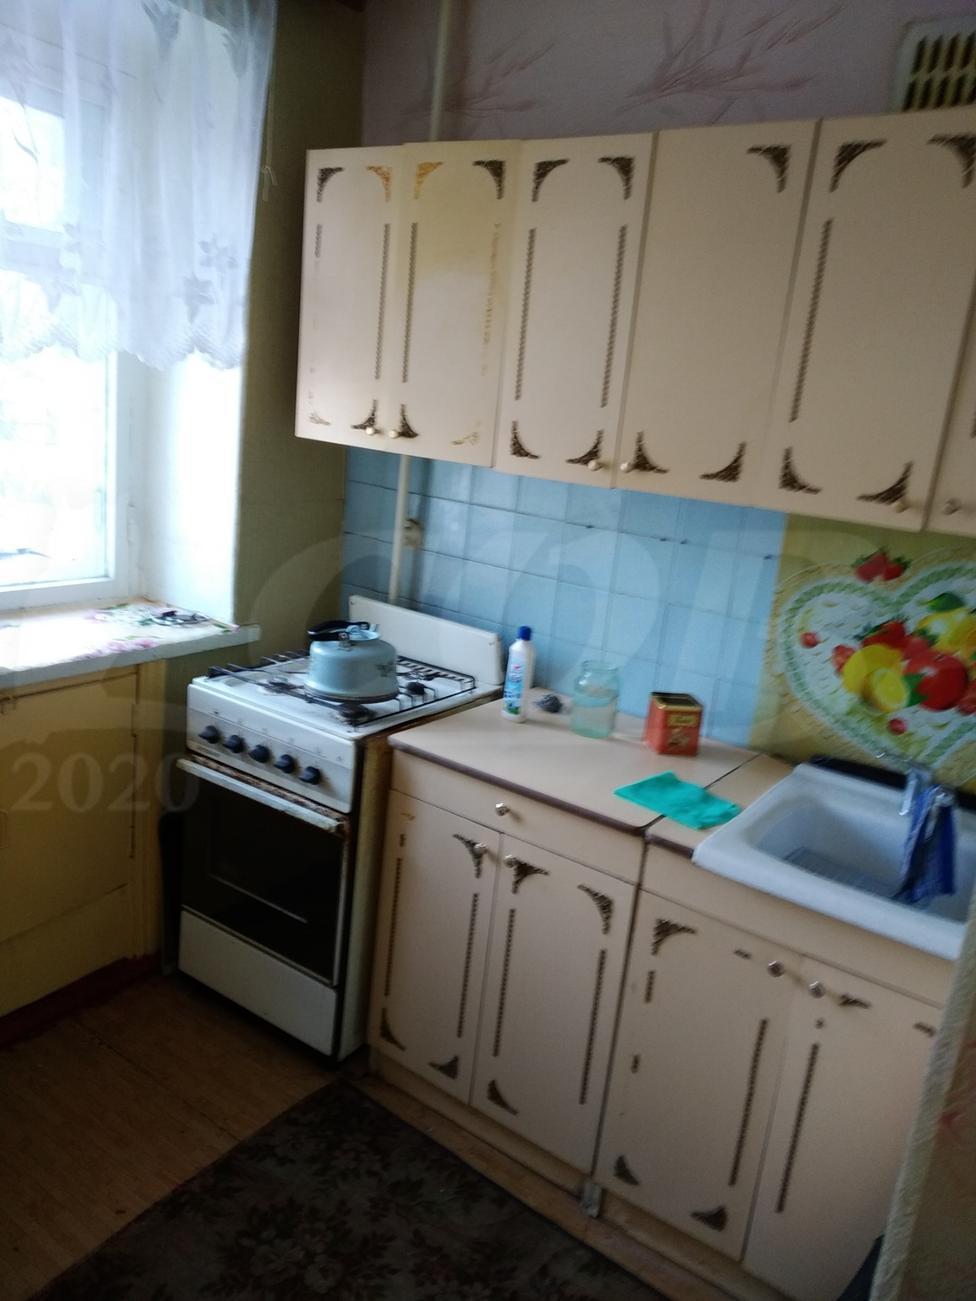 2 комн. квартира в аренду в районе Тарманы, ул. Малышева, г. Тюмень